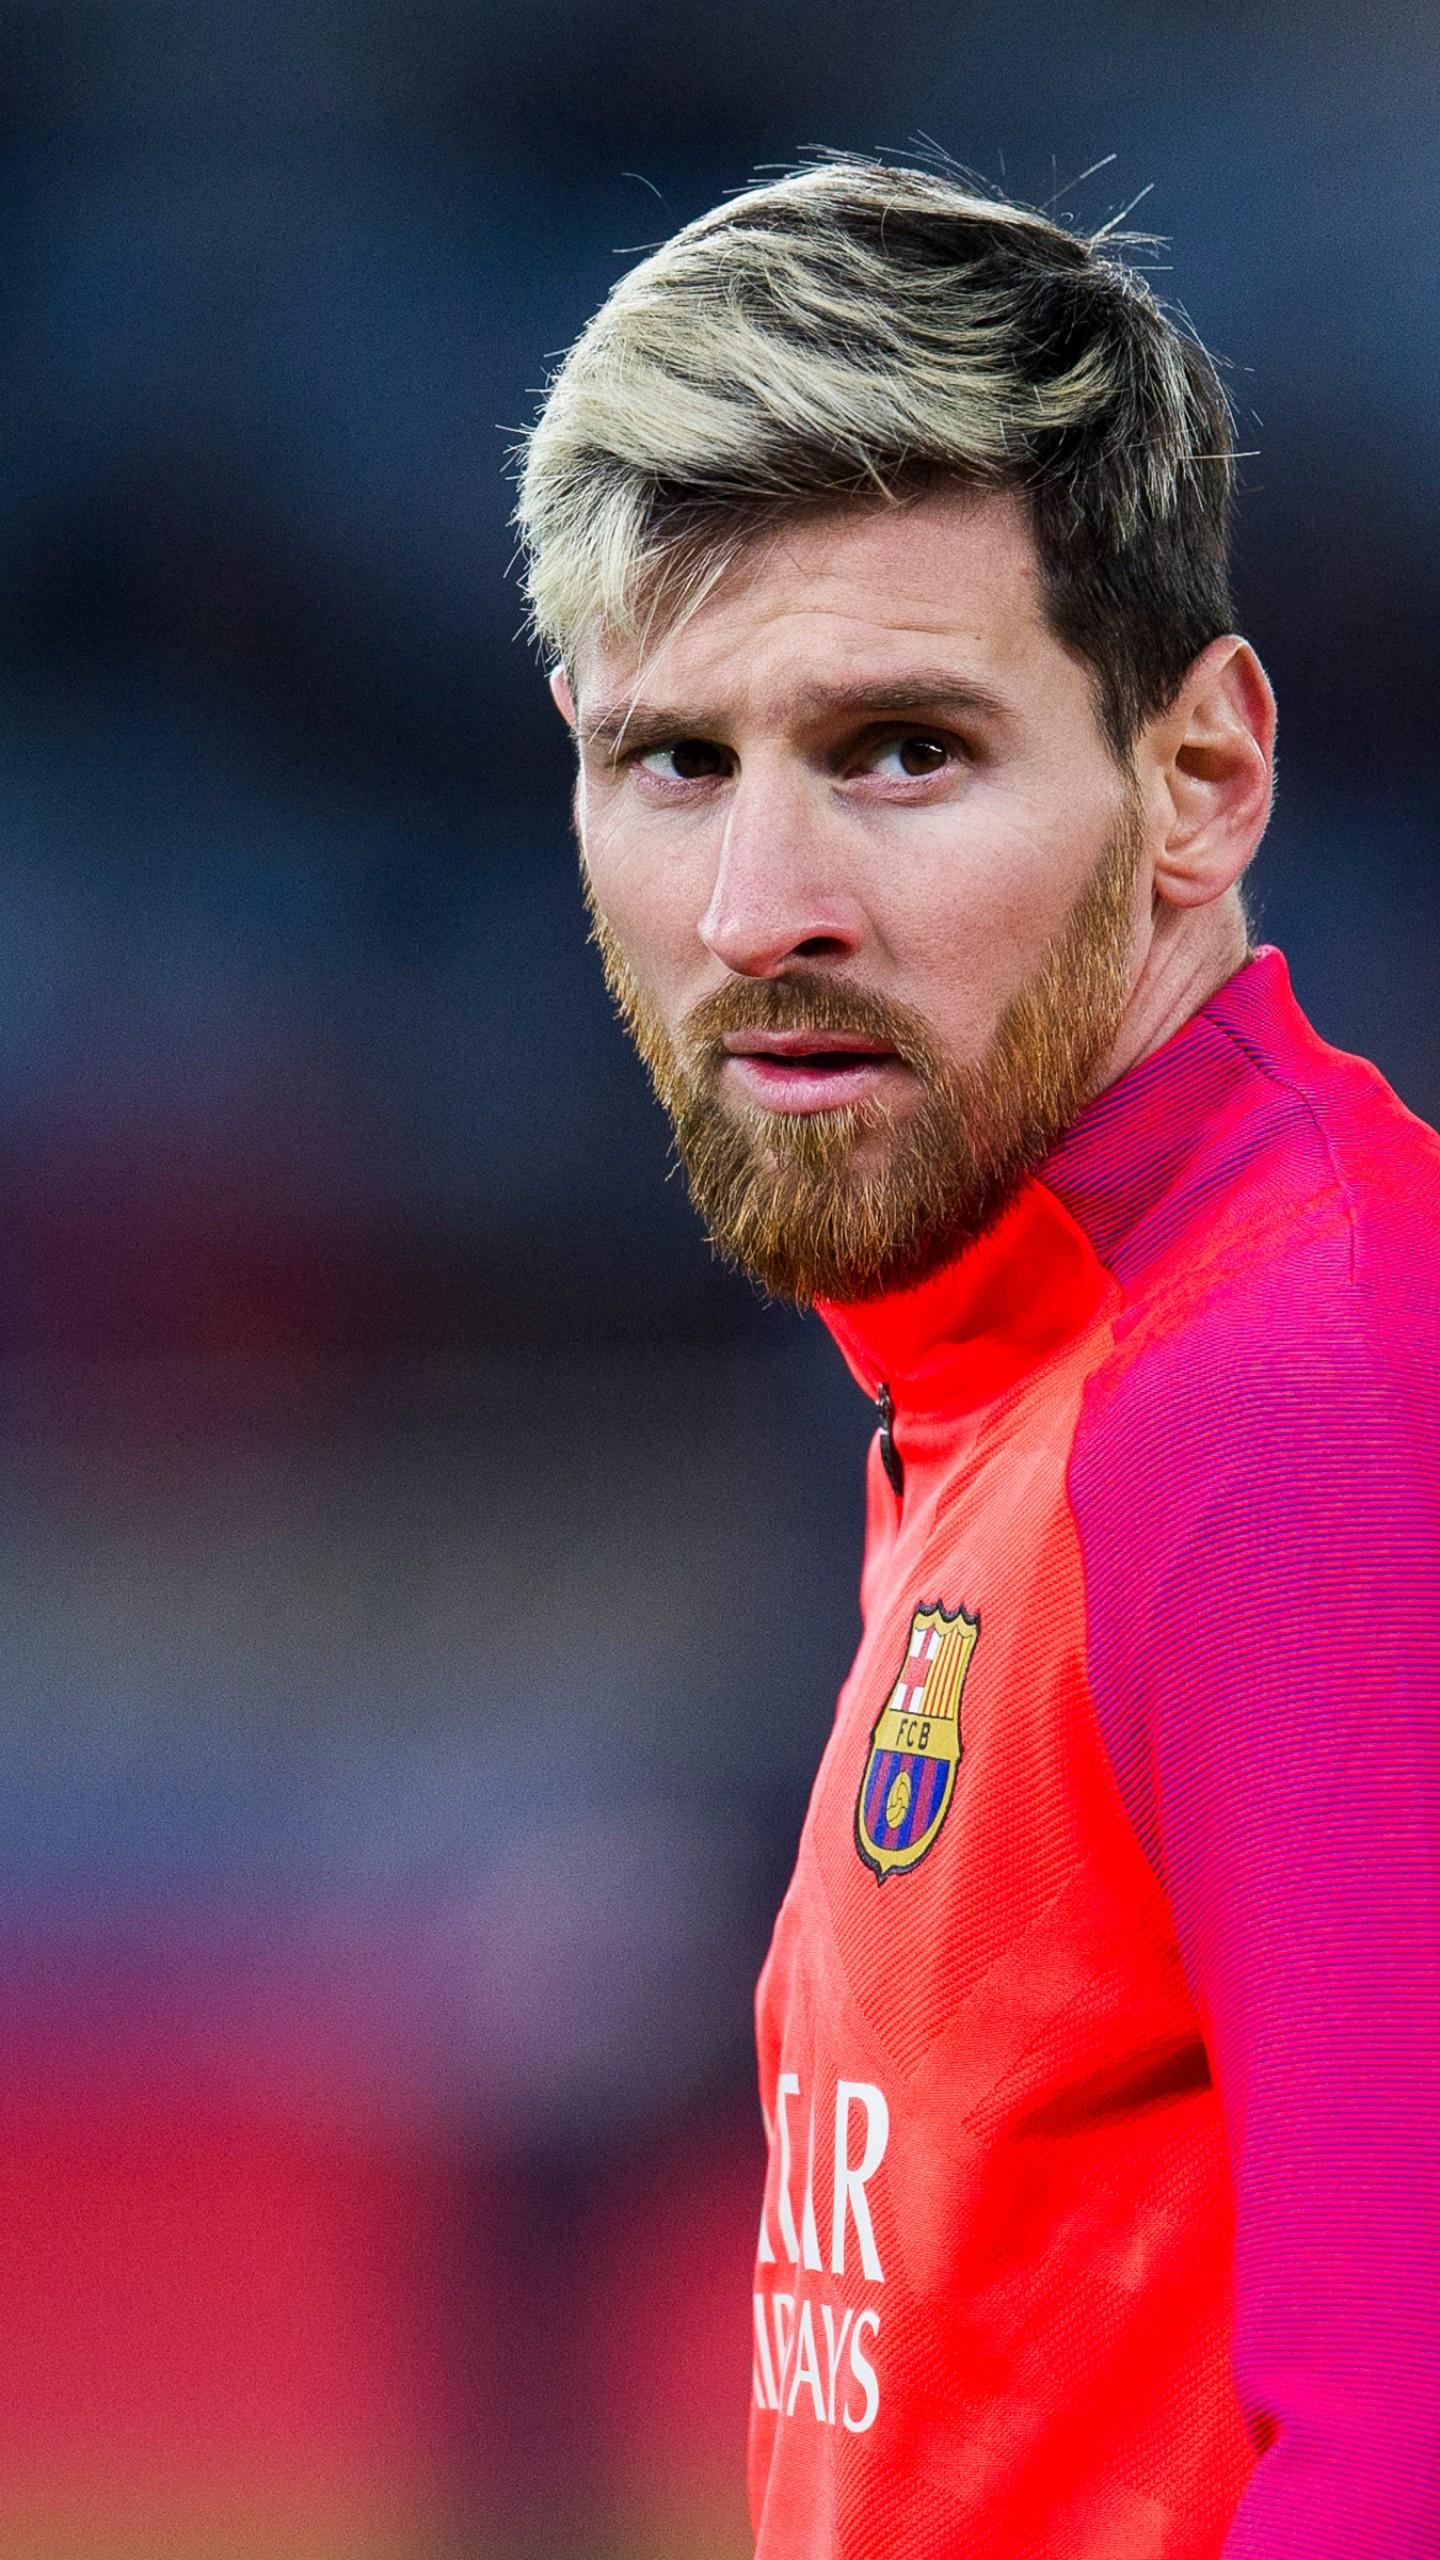 Wallpaper Lionel Messi Barcelona FCB soccer 4K Sport 19805 1440x2560